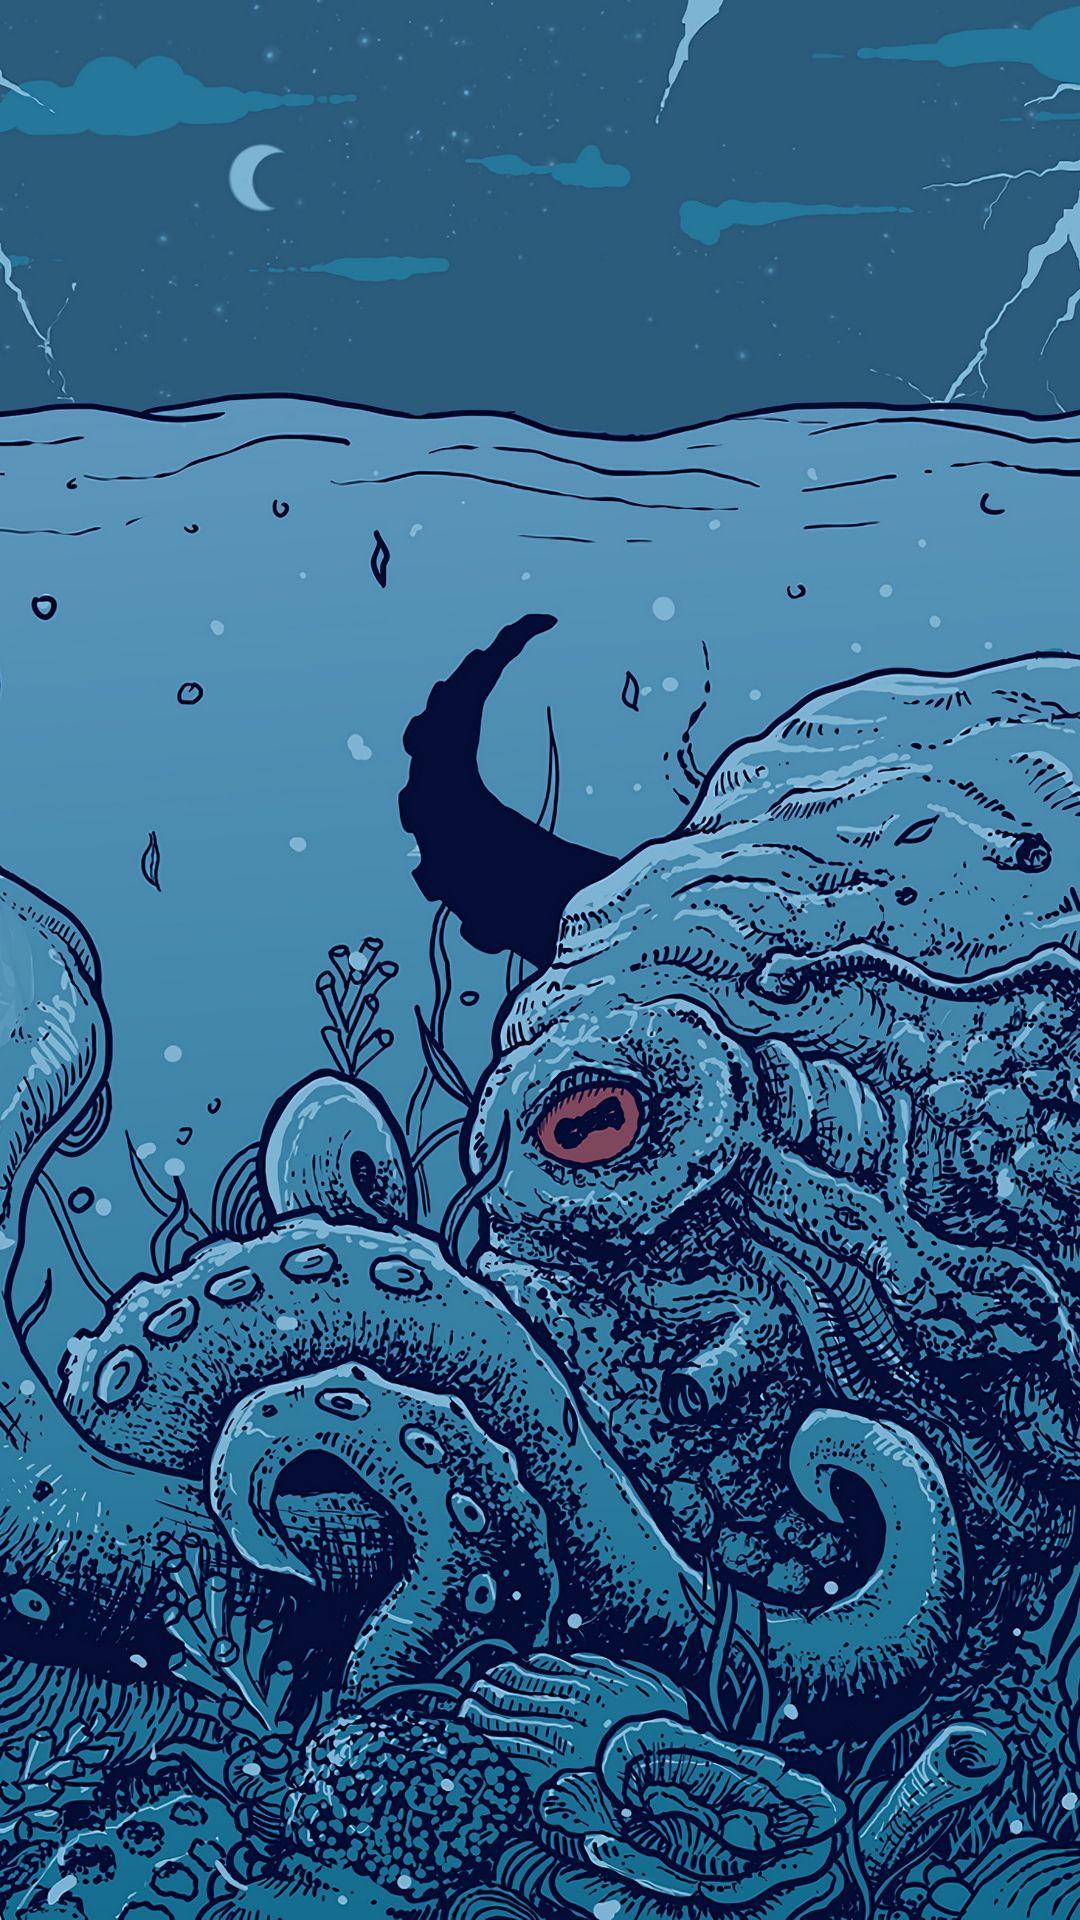 1080x1920 Wallpaper Octopus Underwater World Art